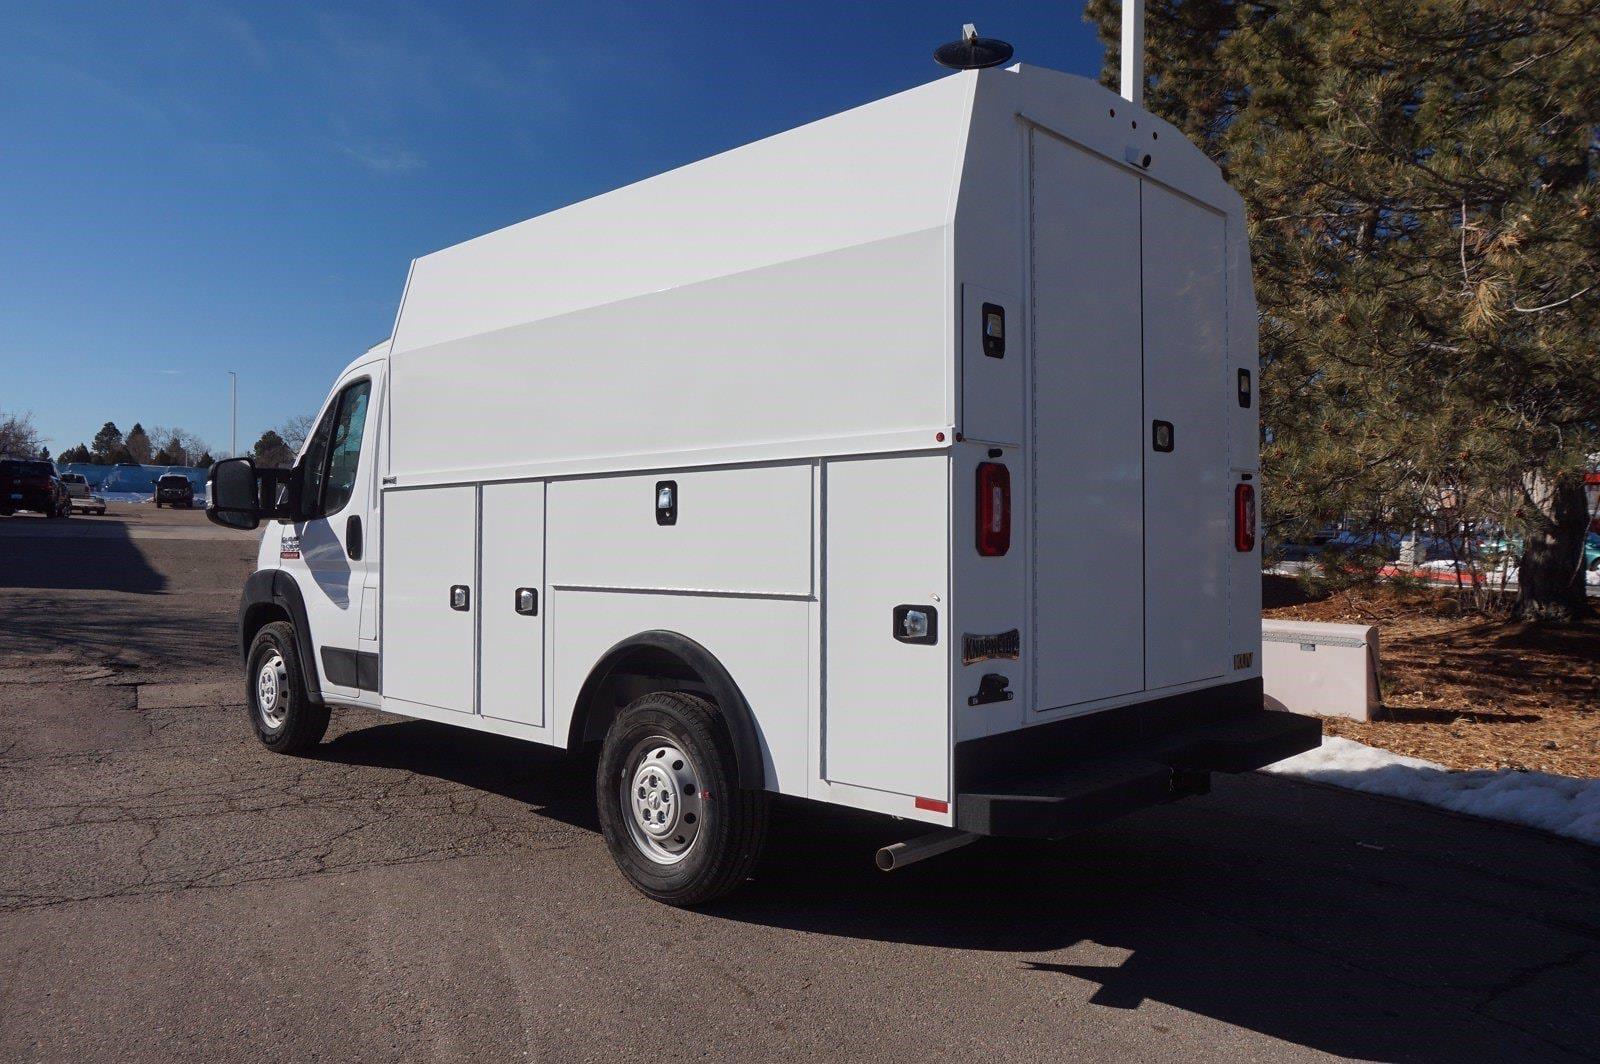 2021 Ram ProMaster 3500 FWD, Service Utility Van #6674X - photo 1